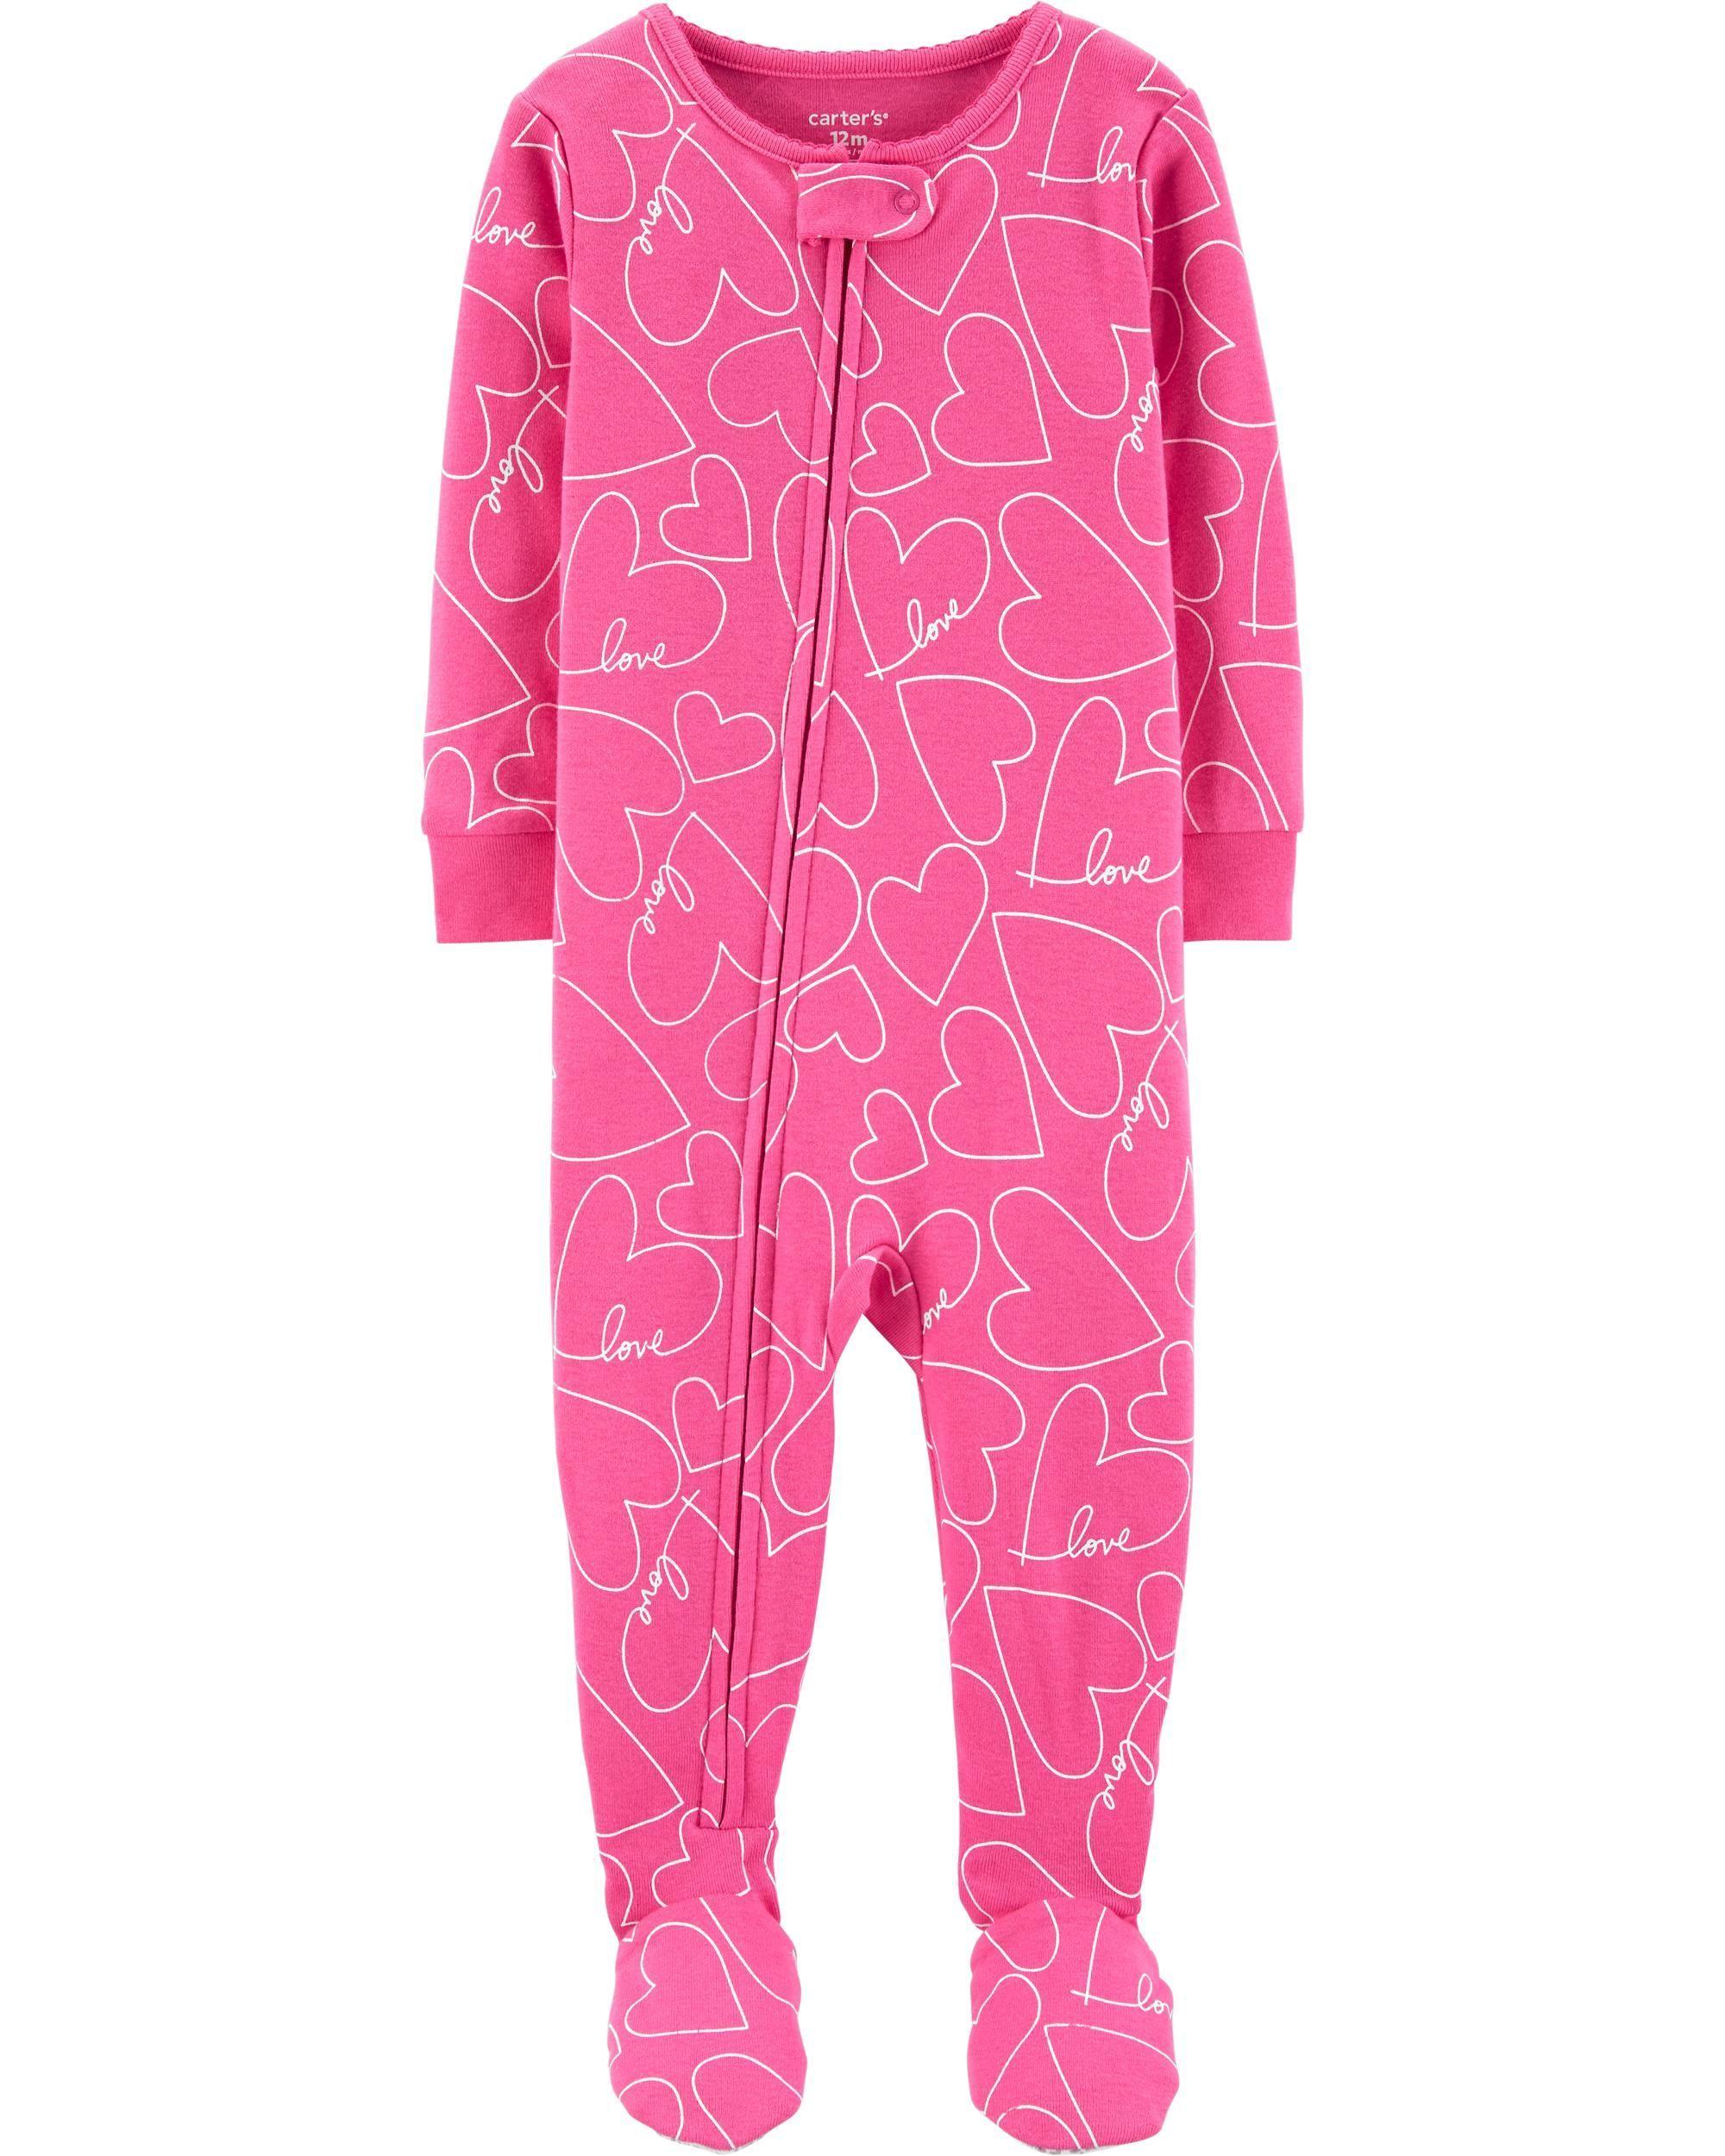 1 Piece Hearts Snug Fit Cotton Footie Pjs Kids Girls